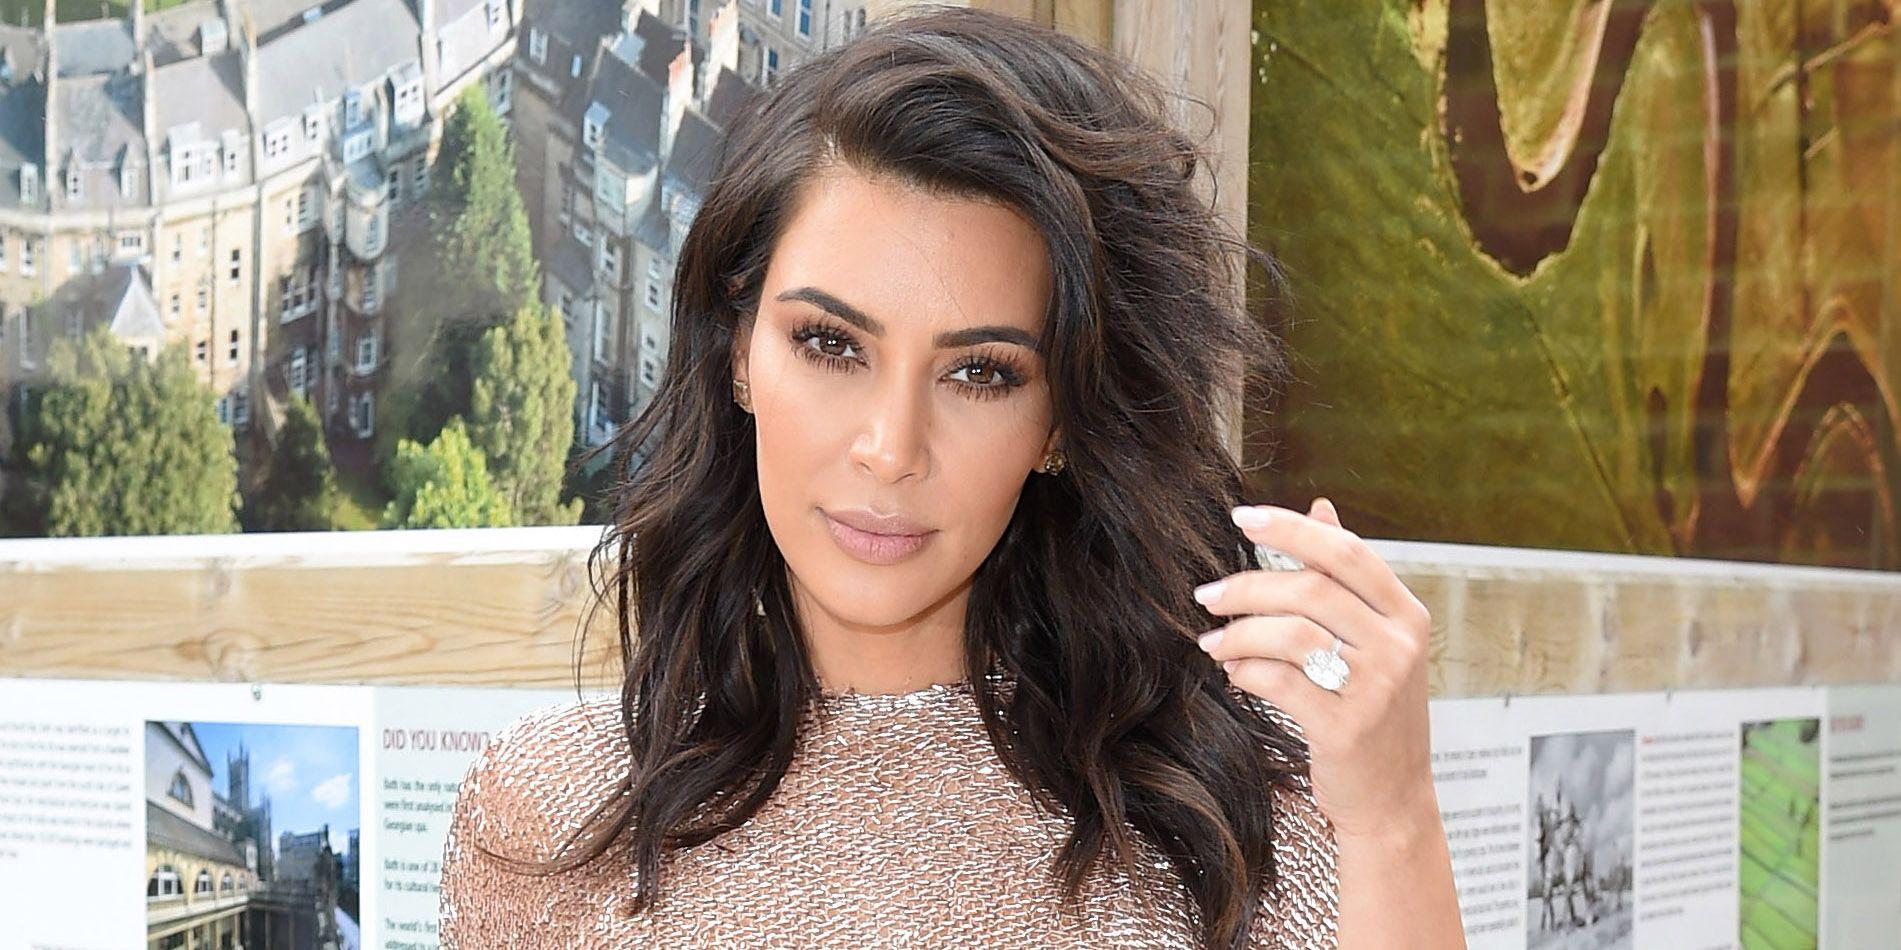 Kim Kardashian West Posts Revealing Bikini Photo on